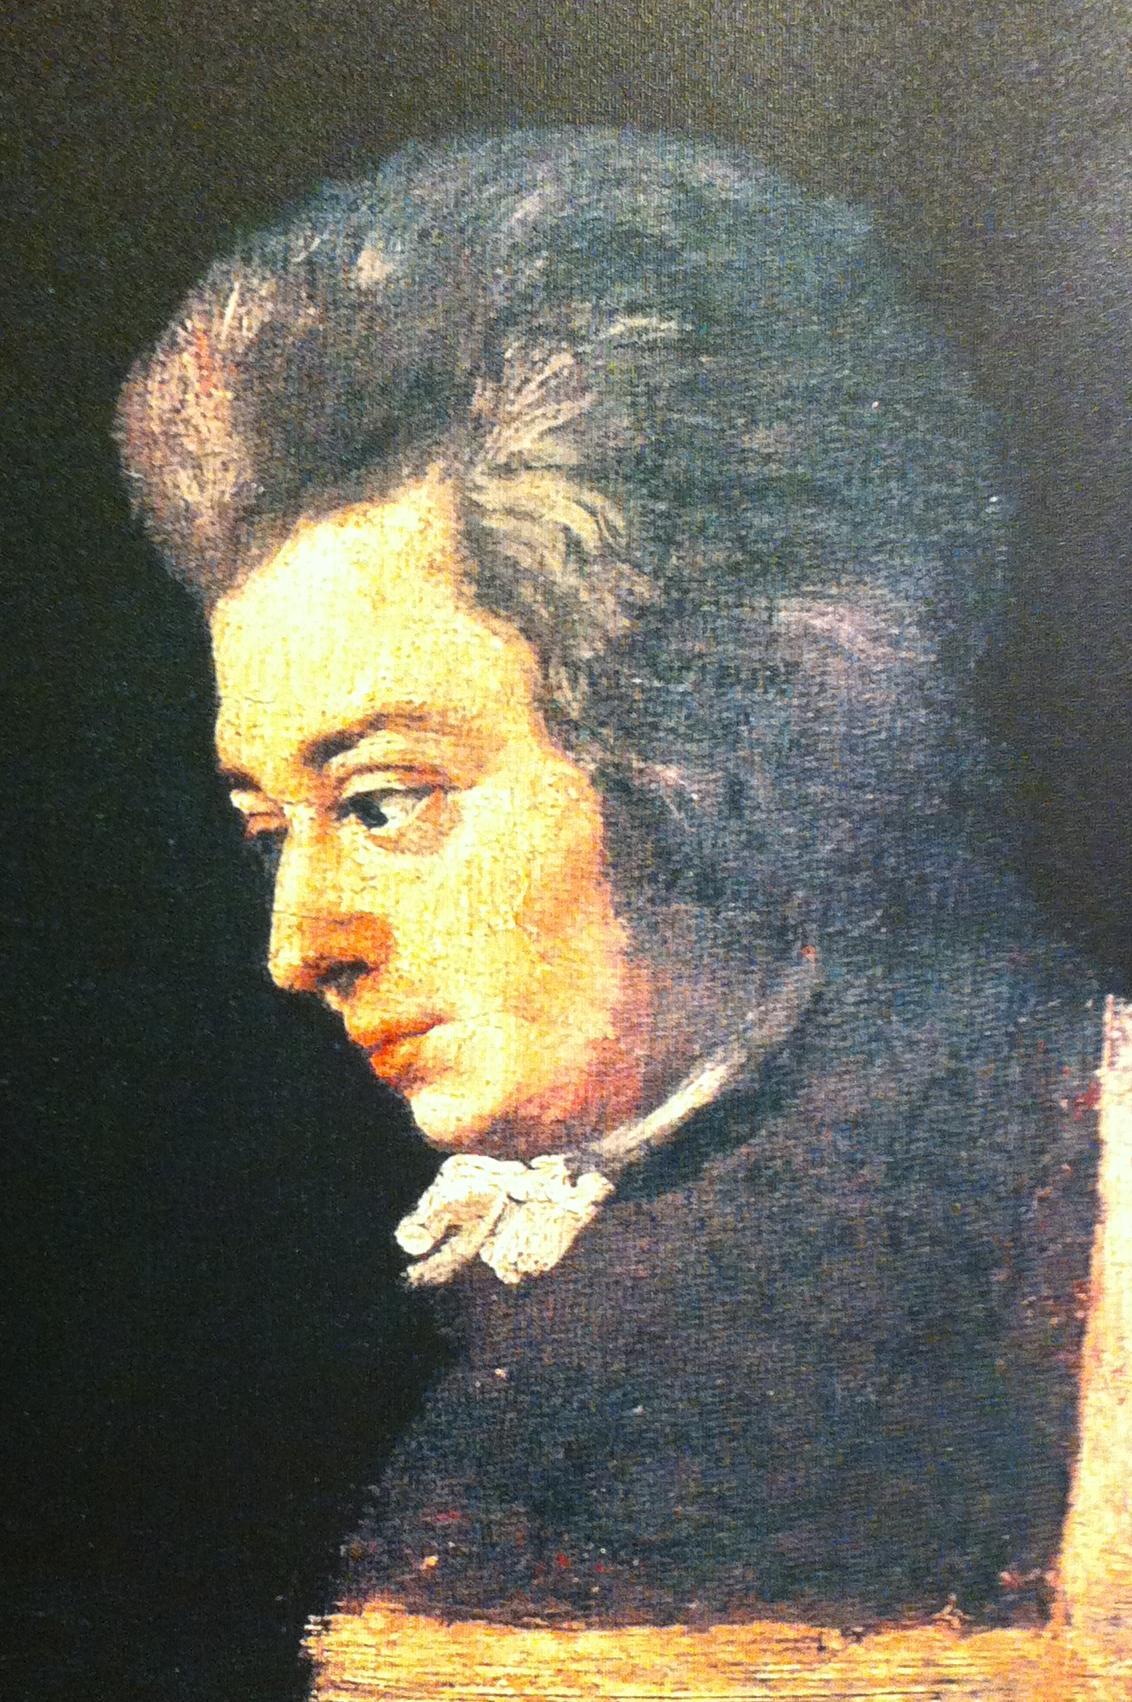 Mozart & Salieri - By Rimsky-Korsakov. Text by Pushkin (trans. Mandarano)